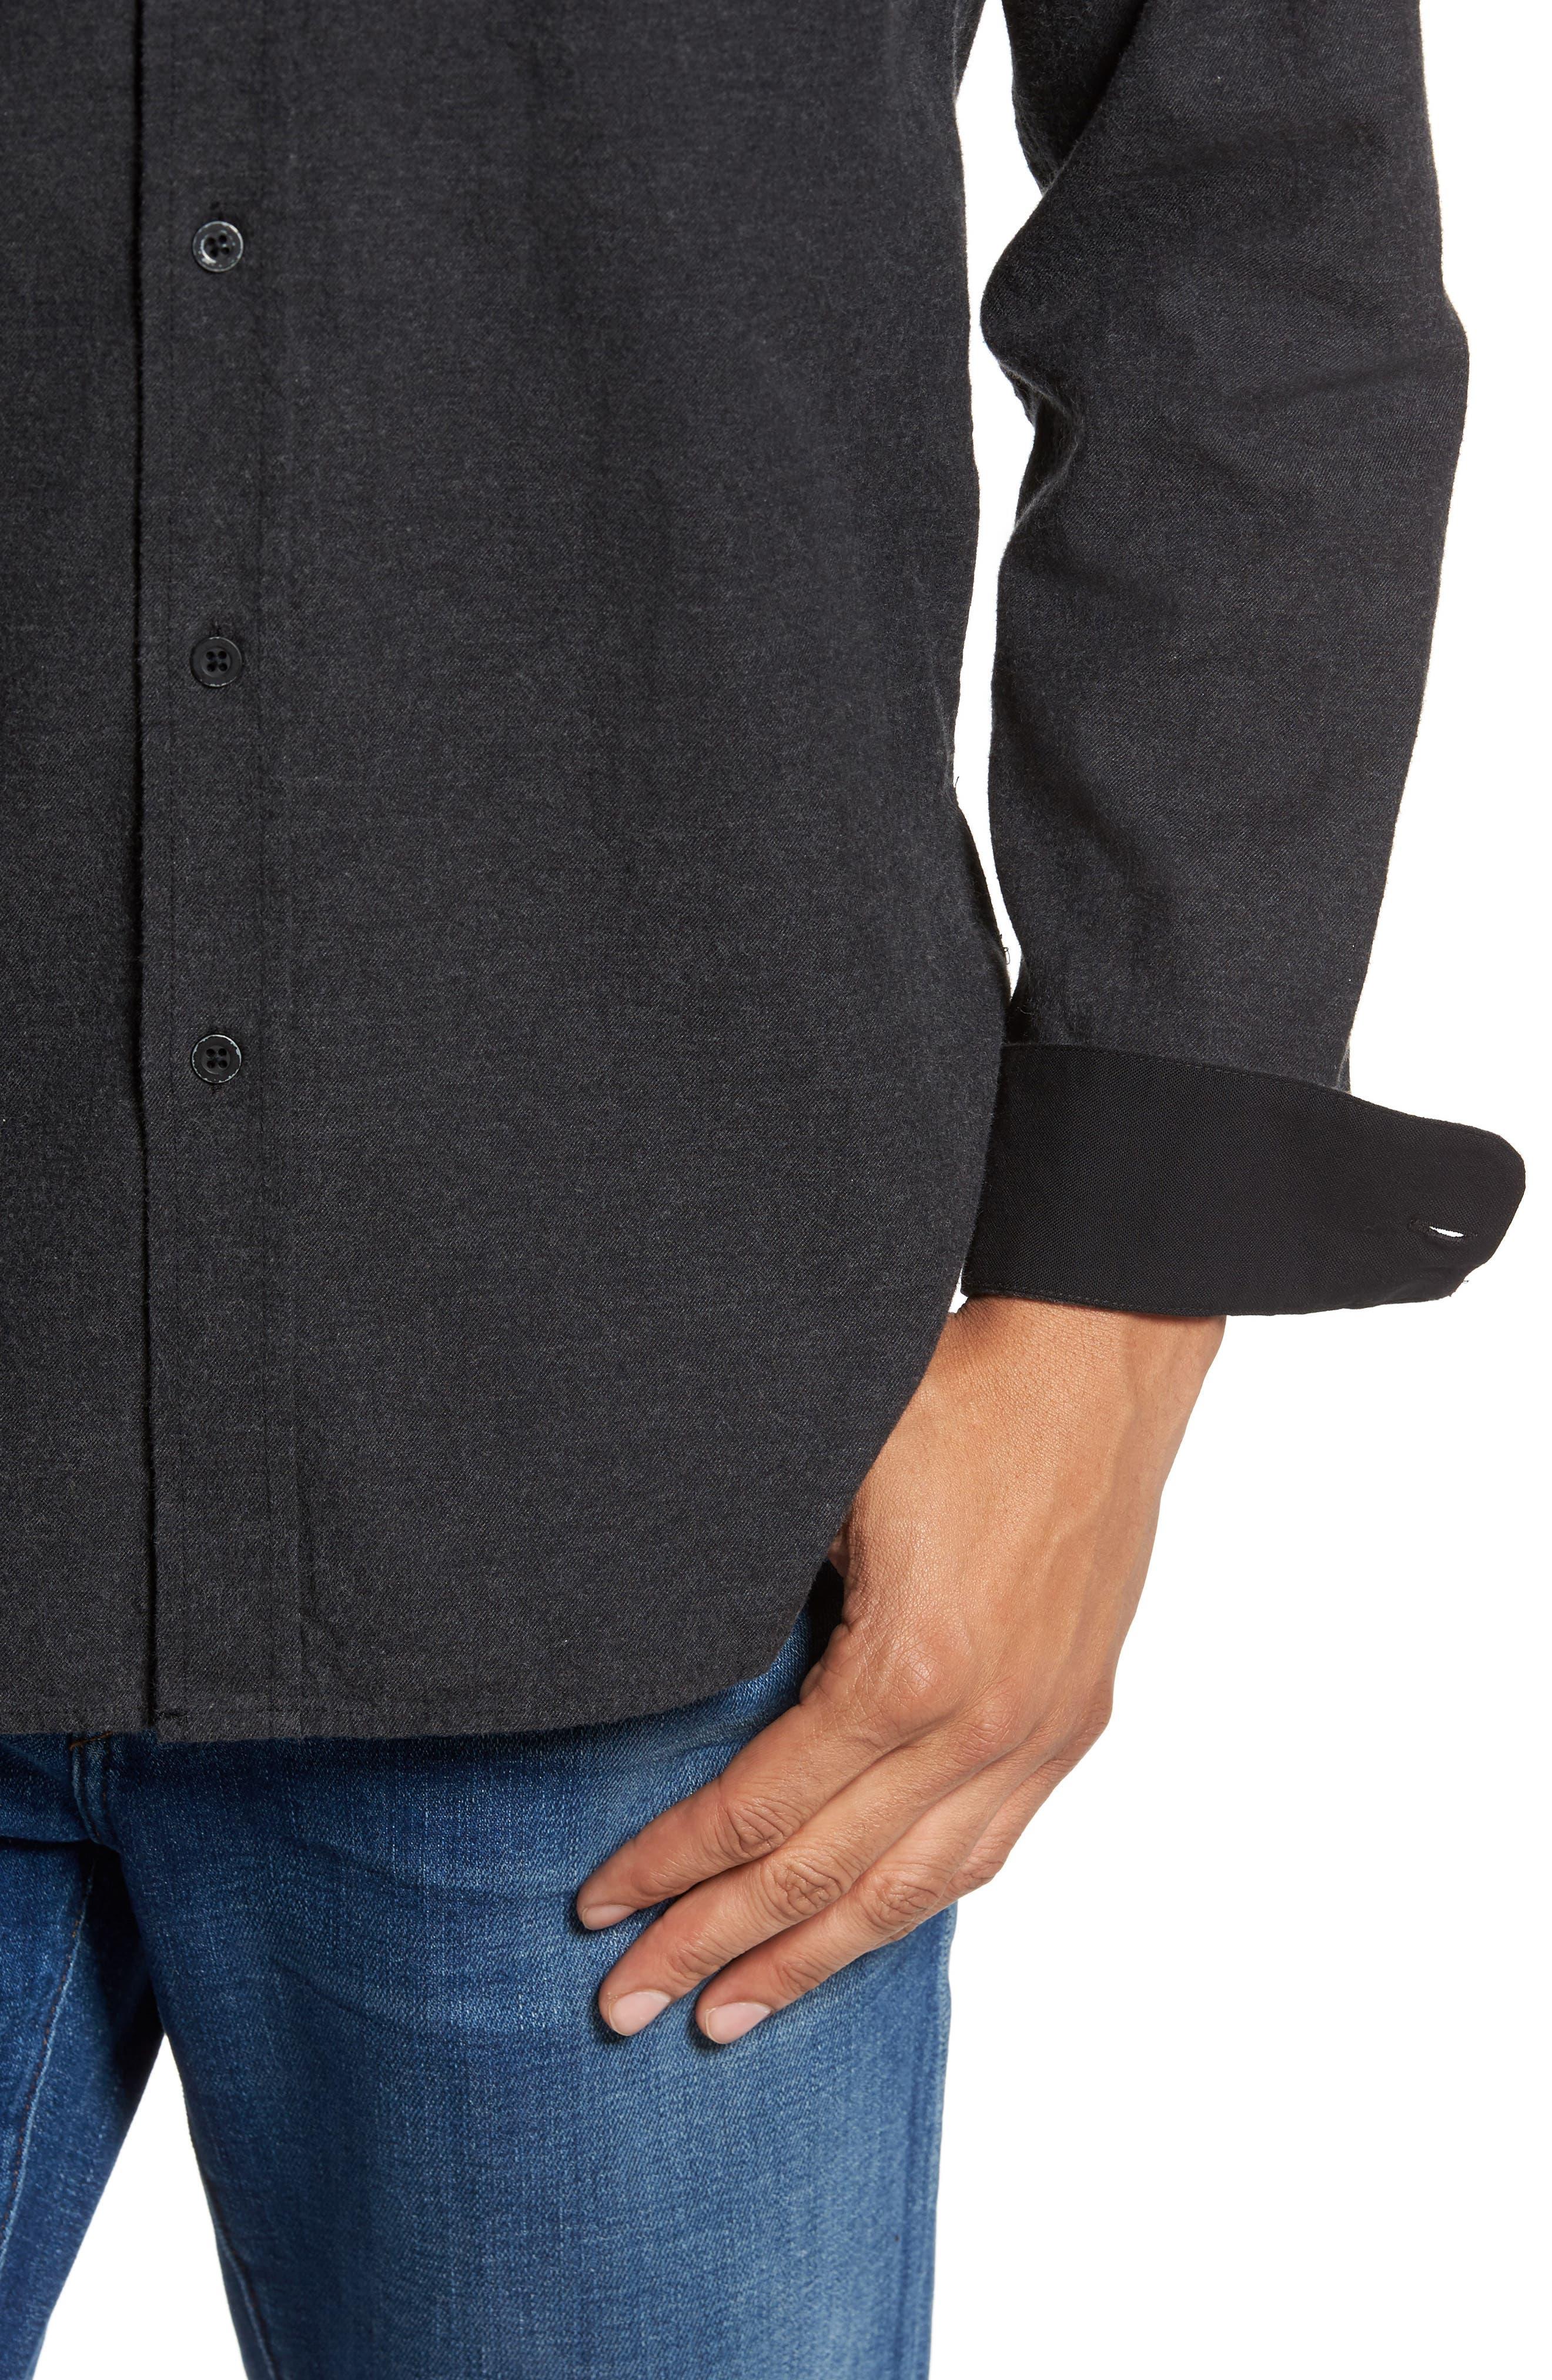 Caleb Slim Fit Sport Shirt,                             Alternate thumbnail 4, color,                             Heather Dark Charcoal